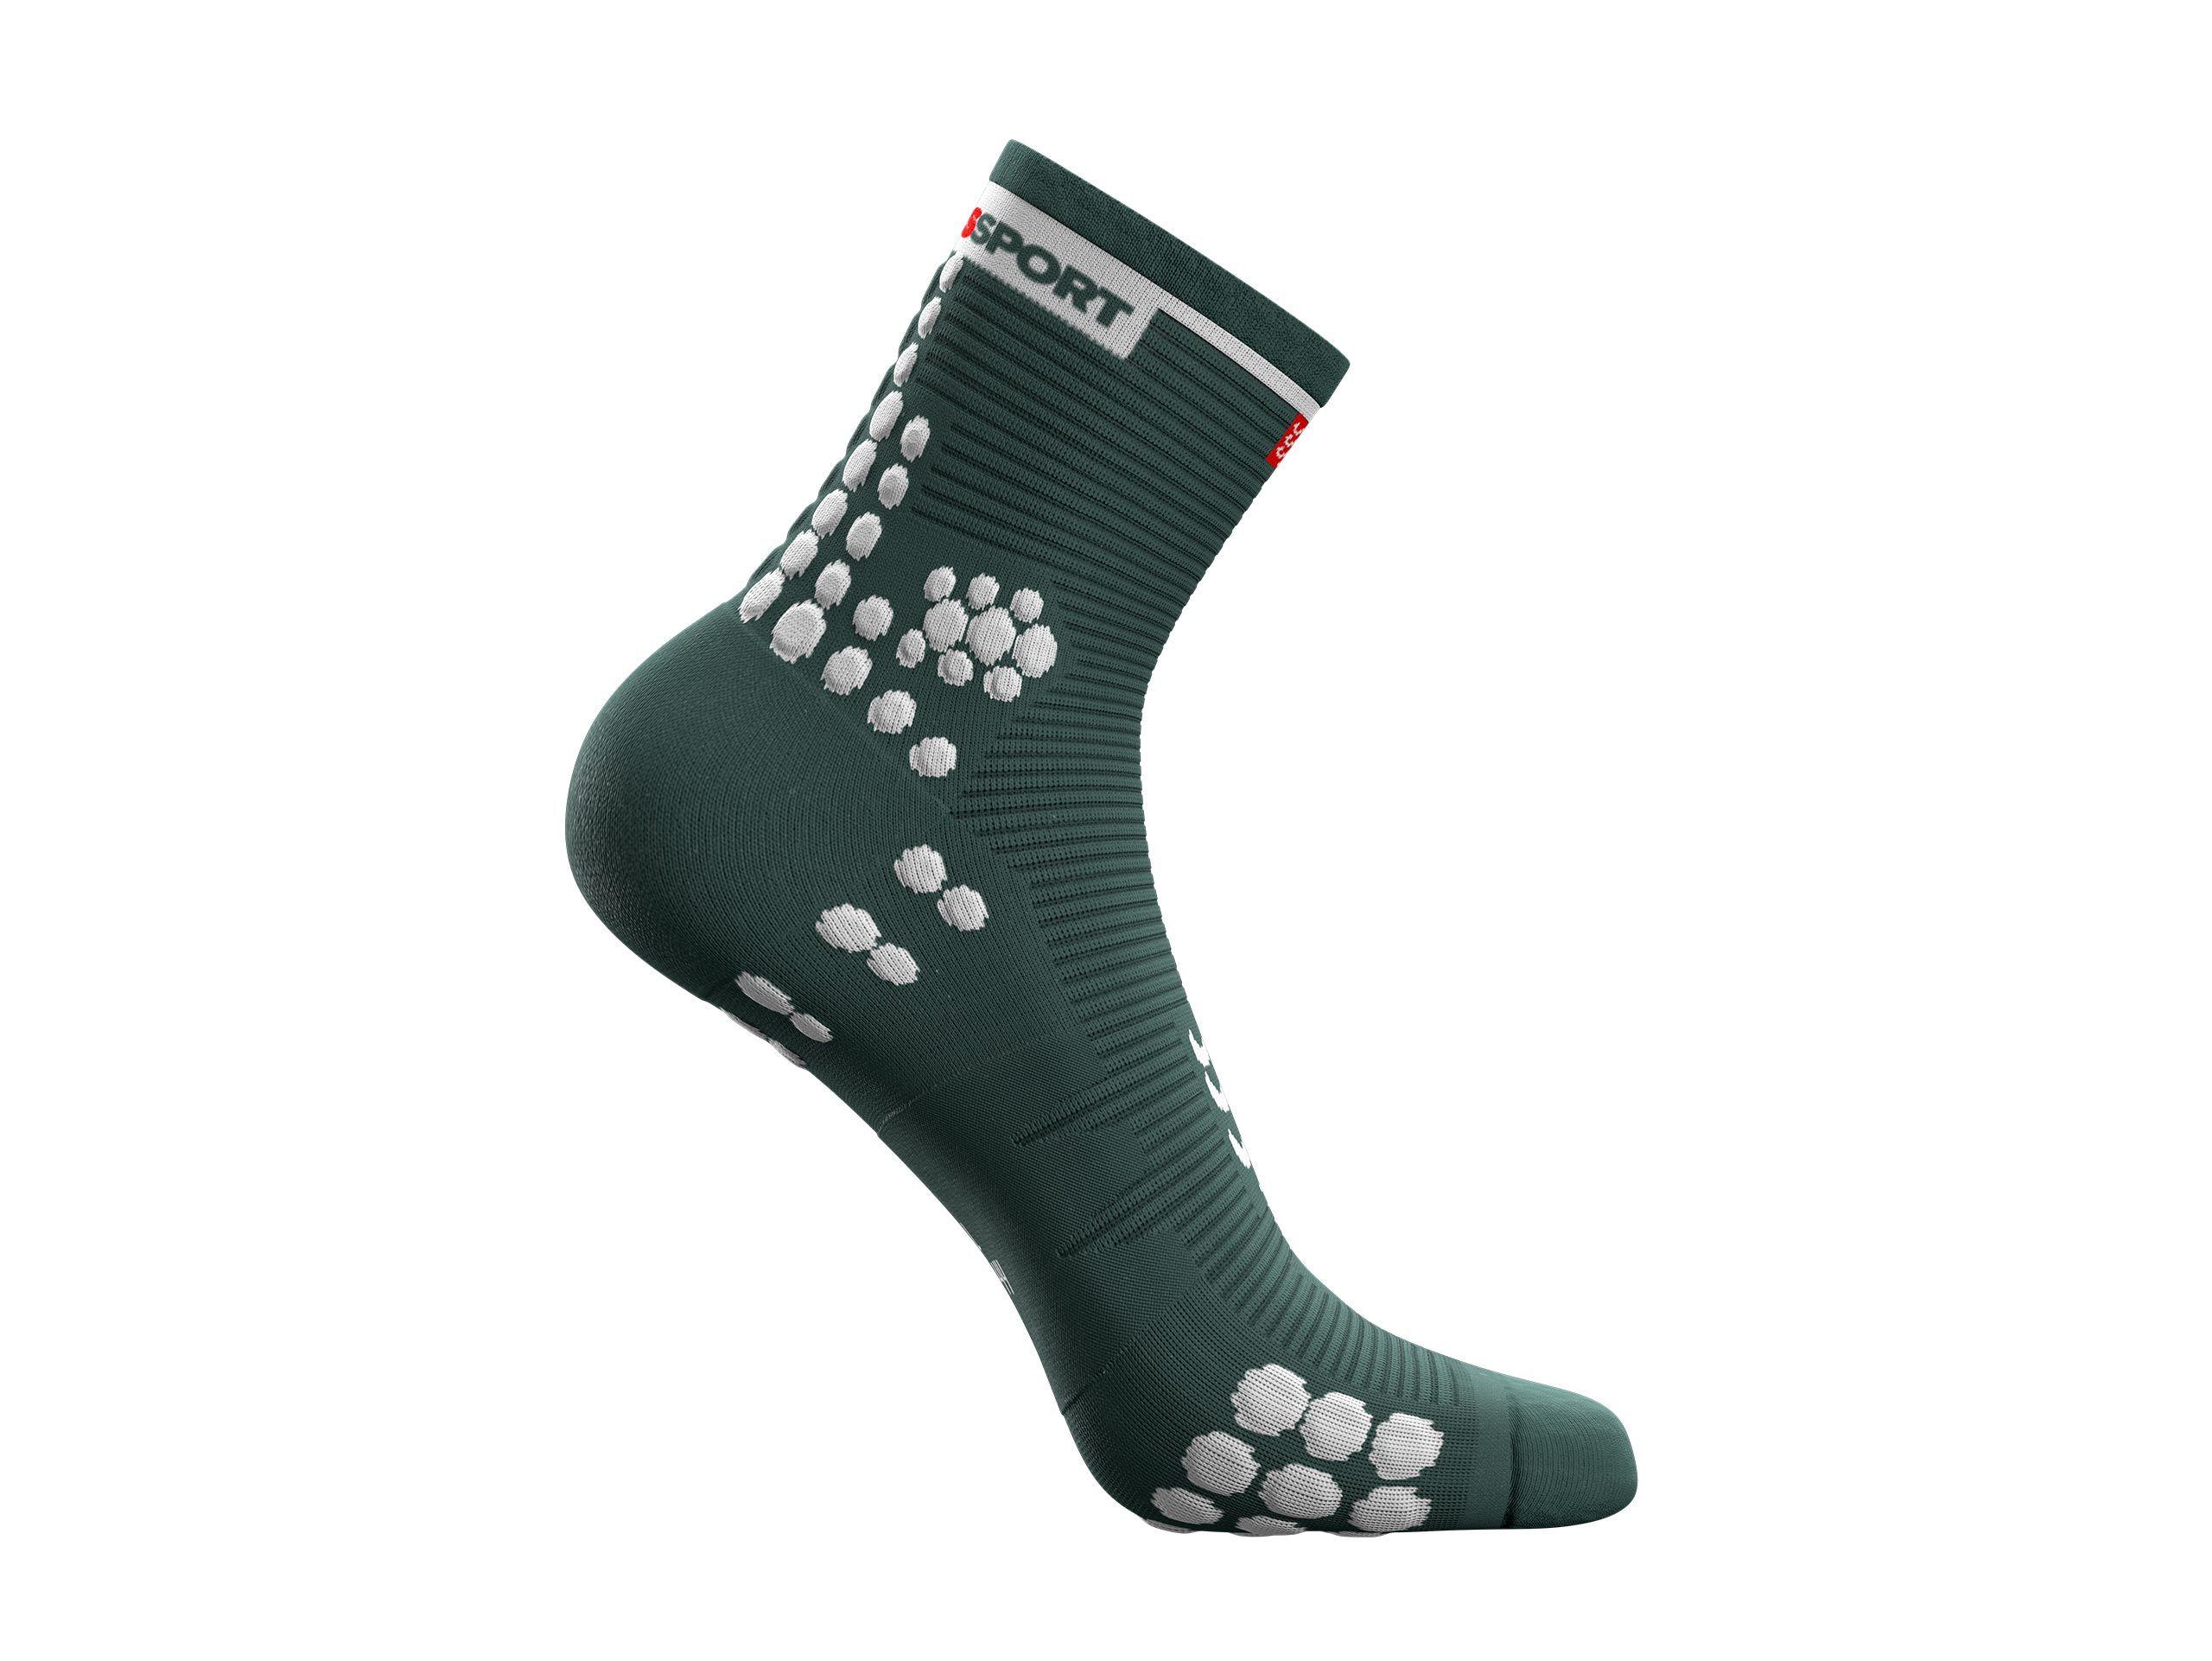 Pro Racing Socks v3.0 Run High - Silver Pine / White